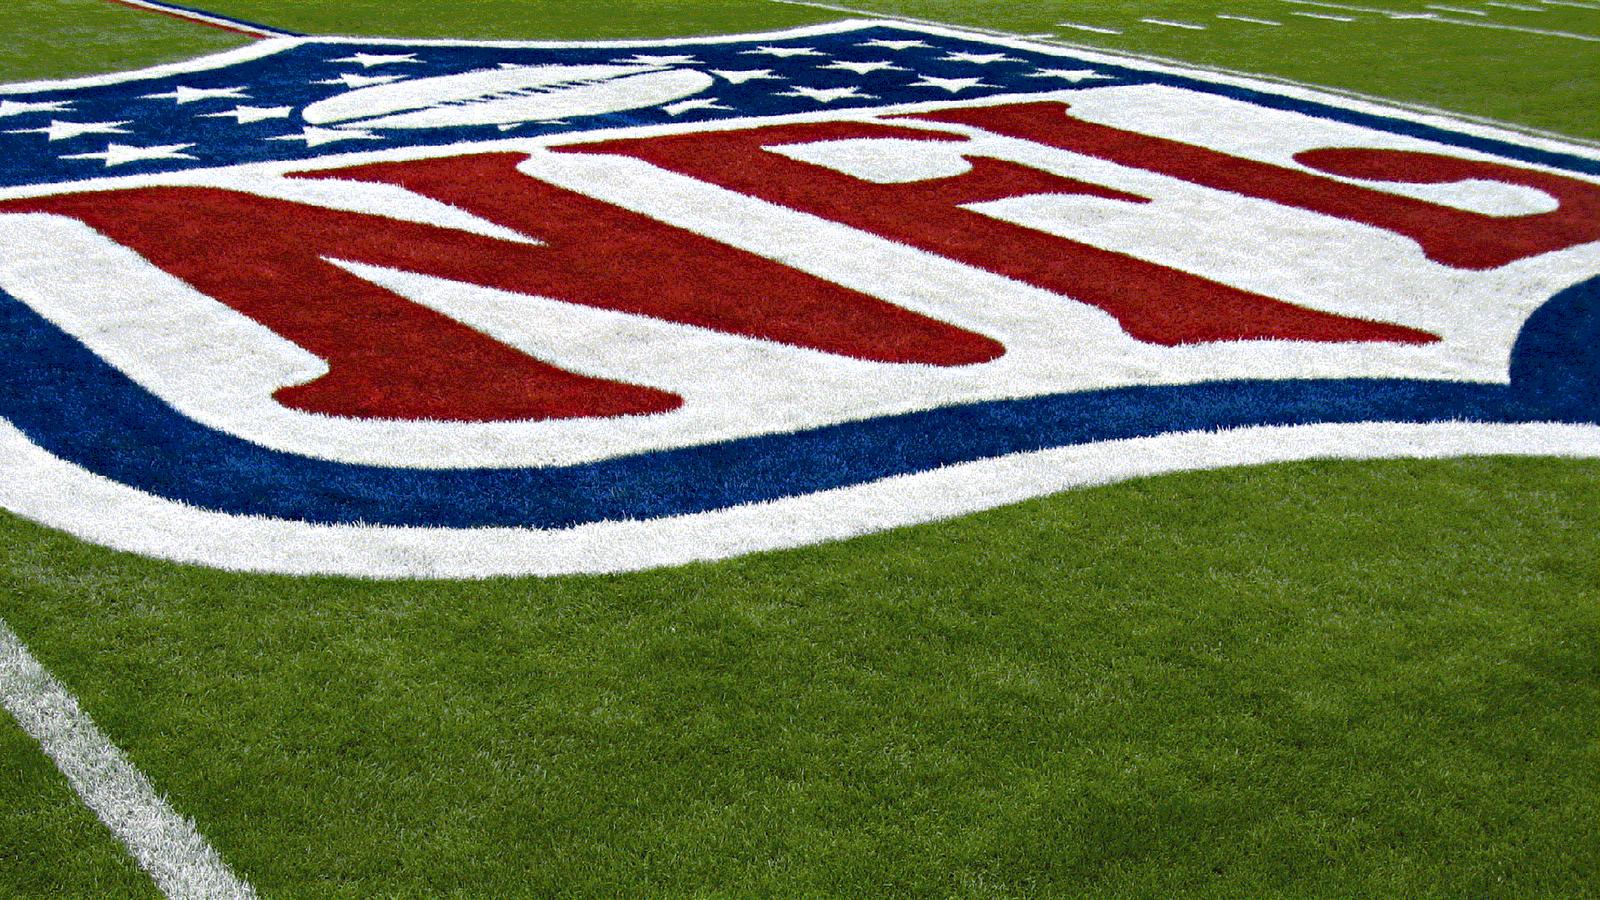 NFL 2012 - Free Download NFL Football HD Wallpapers for iPad and Nexus    Nfl Football Field Wallpaper